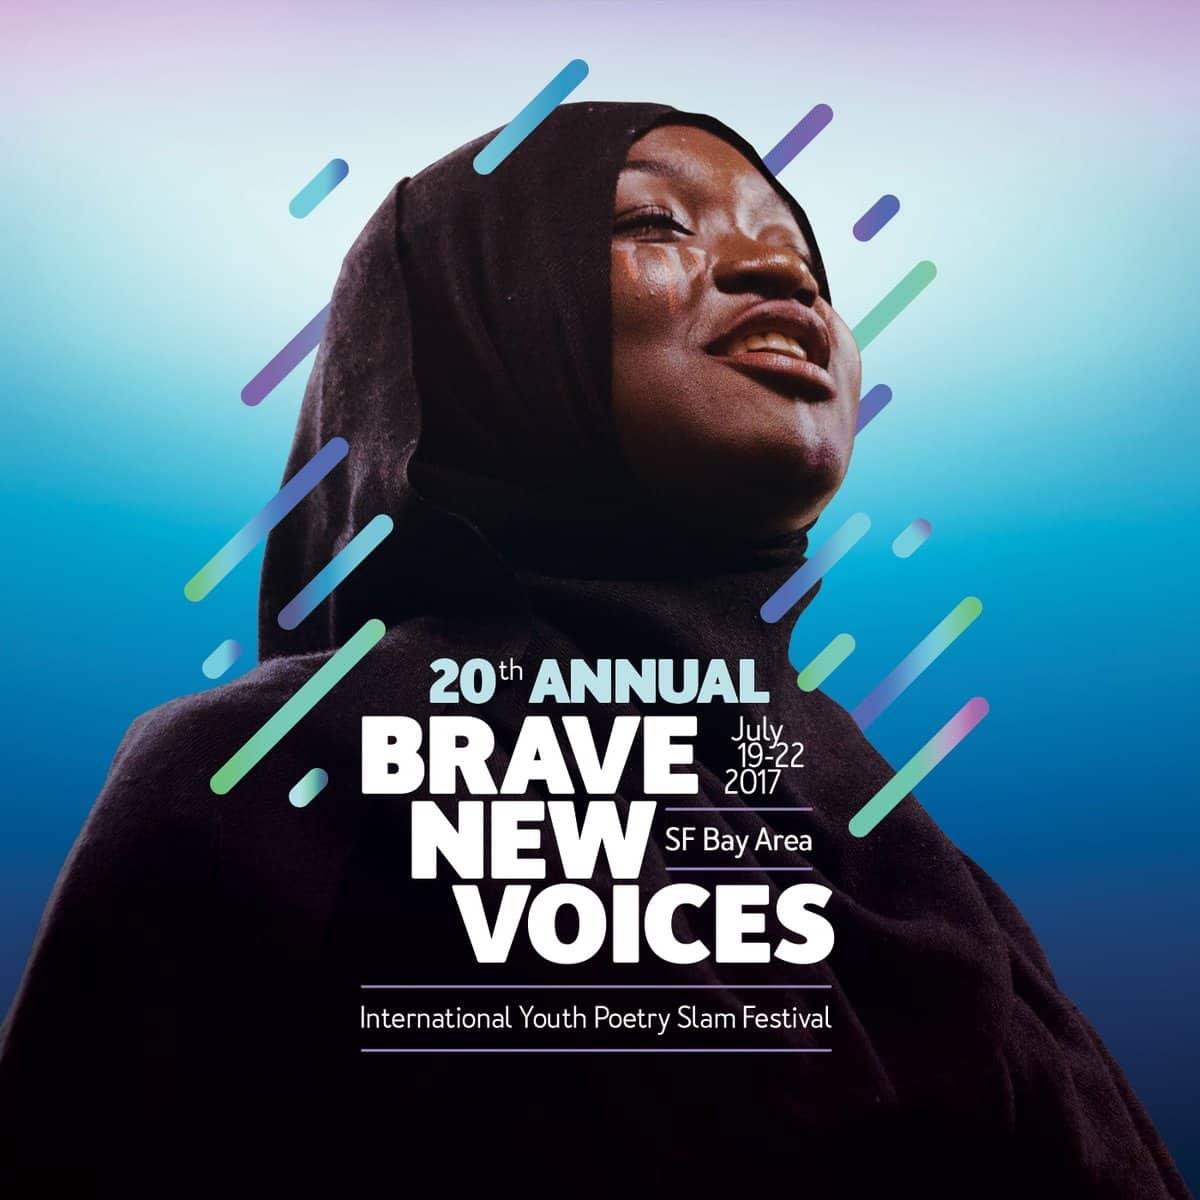 20th Annual Brave New Voices Festival